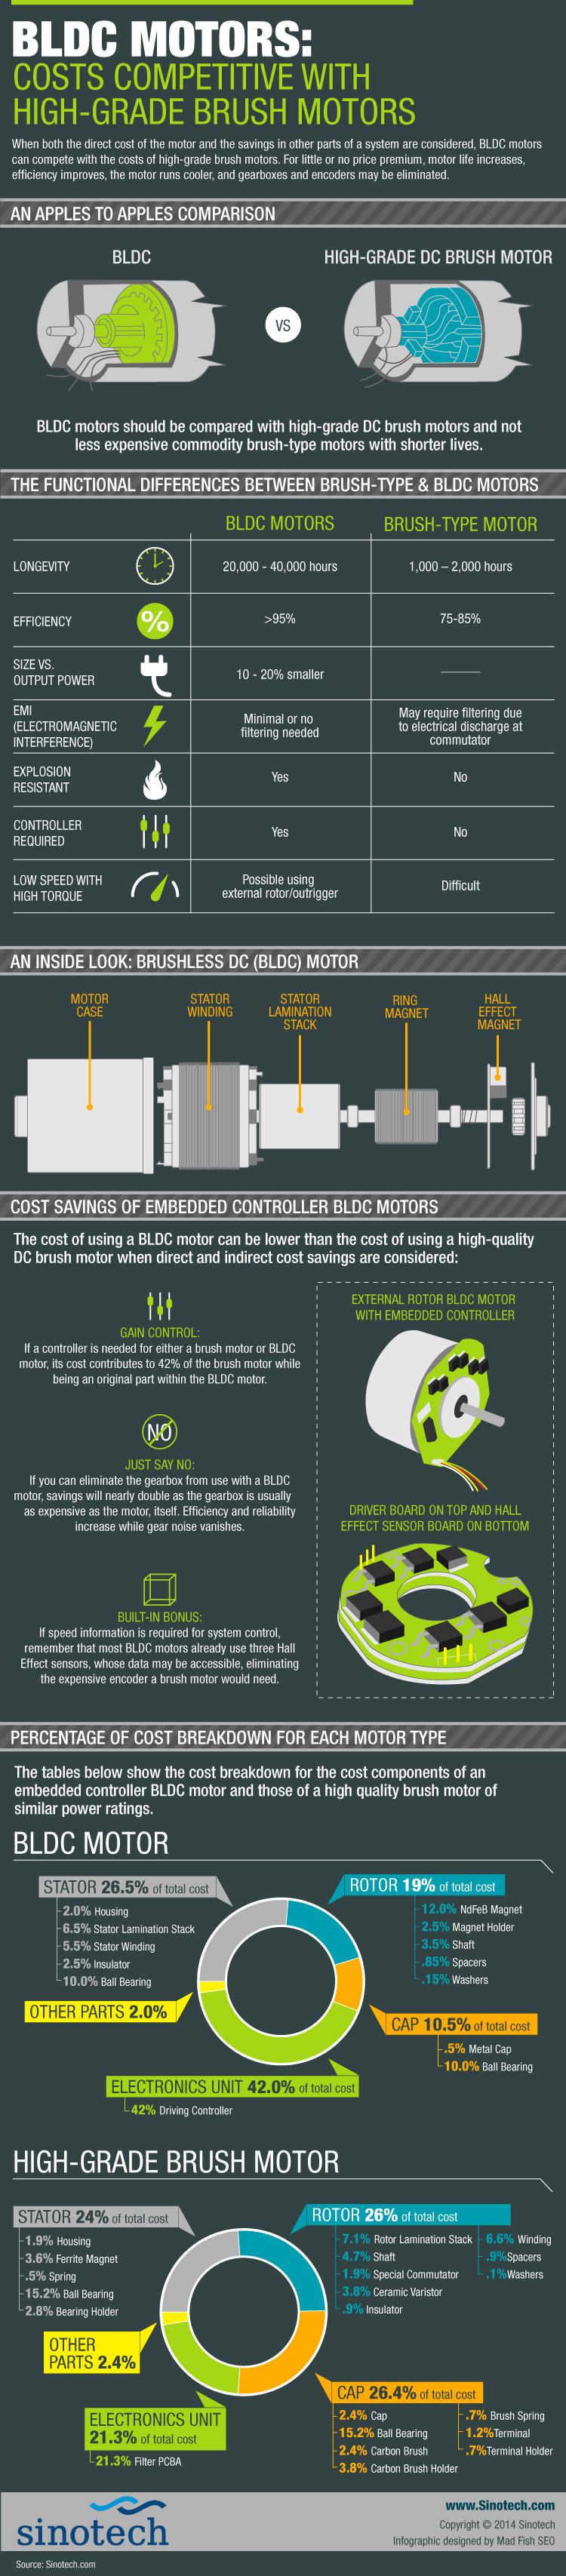 Bldc Motors Costs Competitive With High Grade Brush Stripboard Veroboard Matrix Board Design Software Electrical